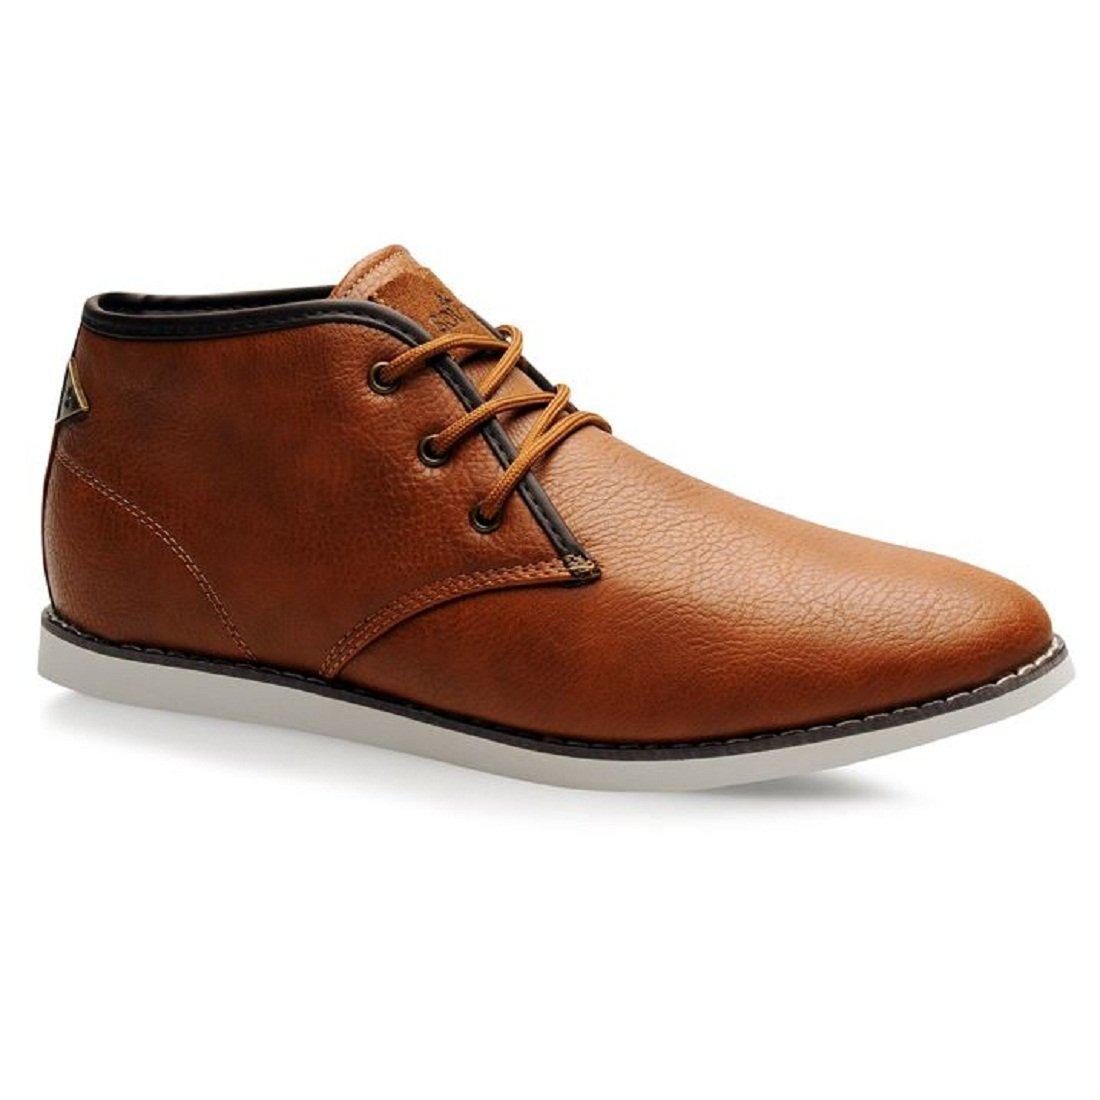 Mens Soviet White Chapel Mid Boots Shoes Tan (UK 8.5 / US 9)